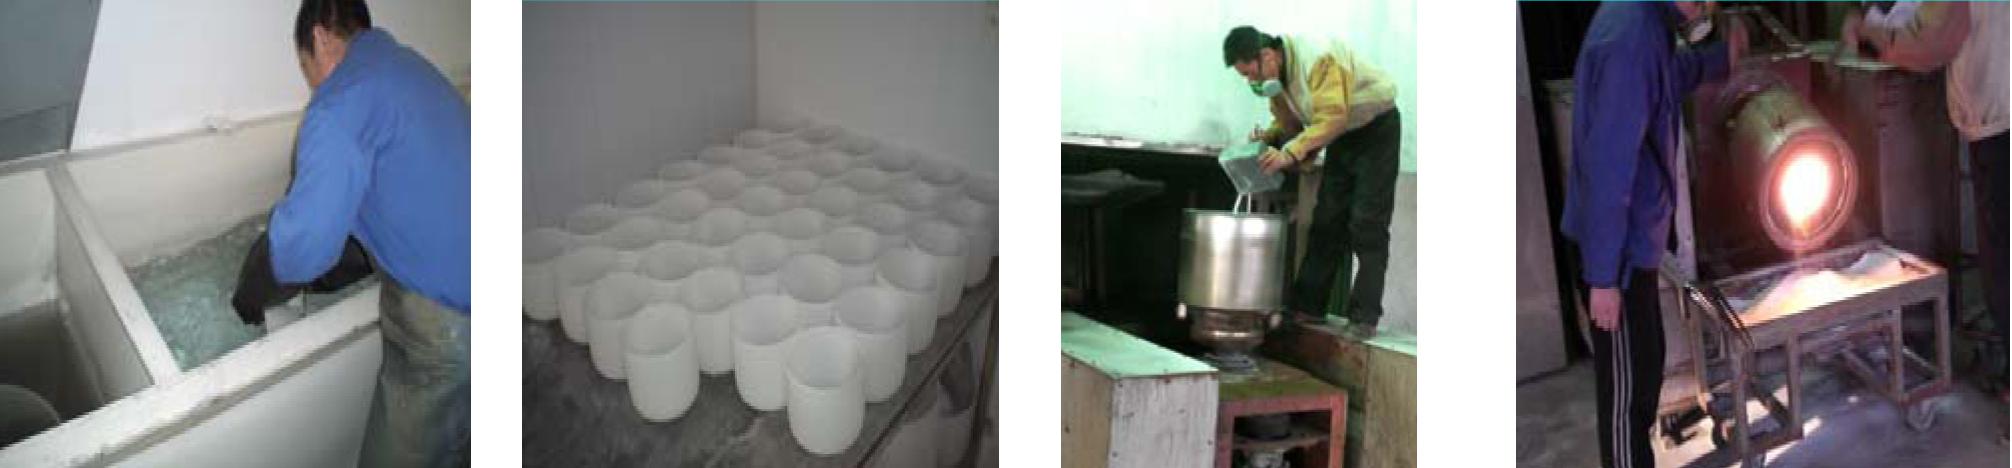 fabrication des bols en cristal